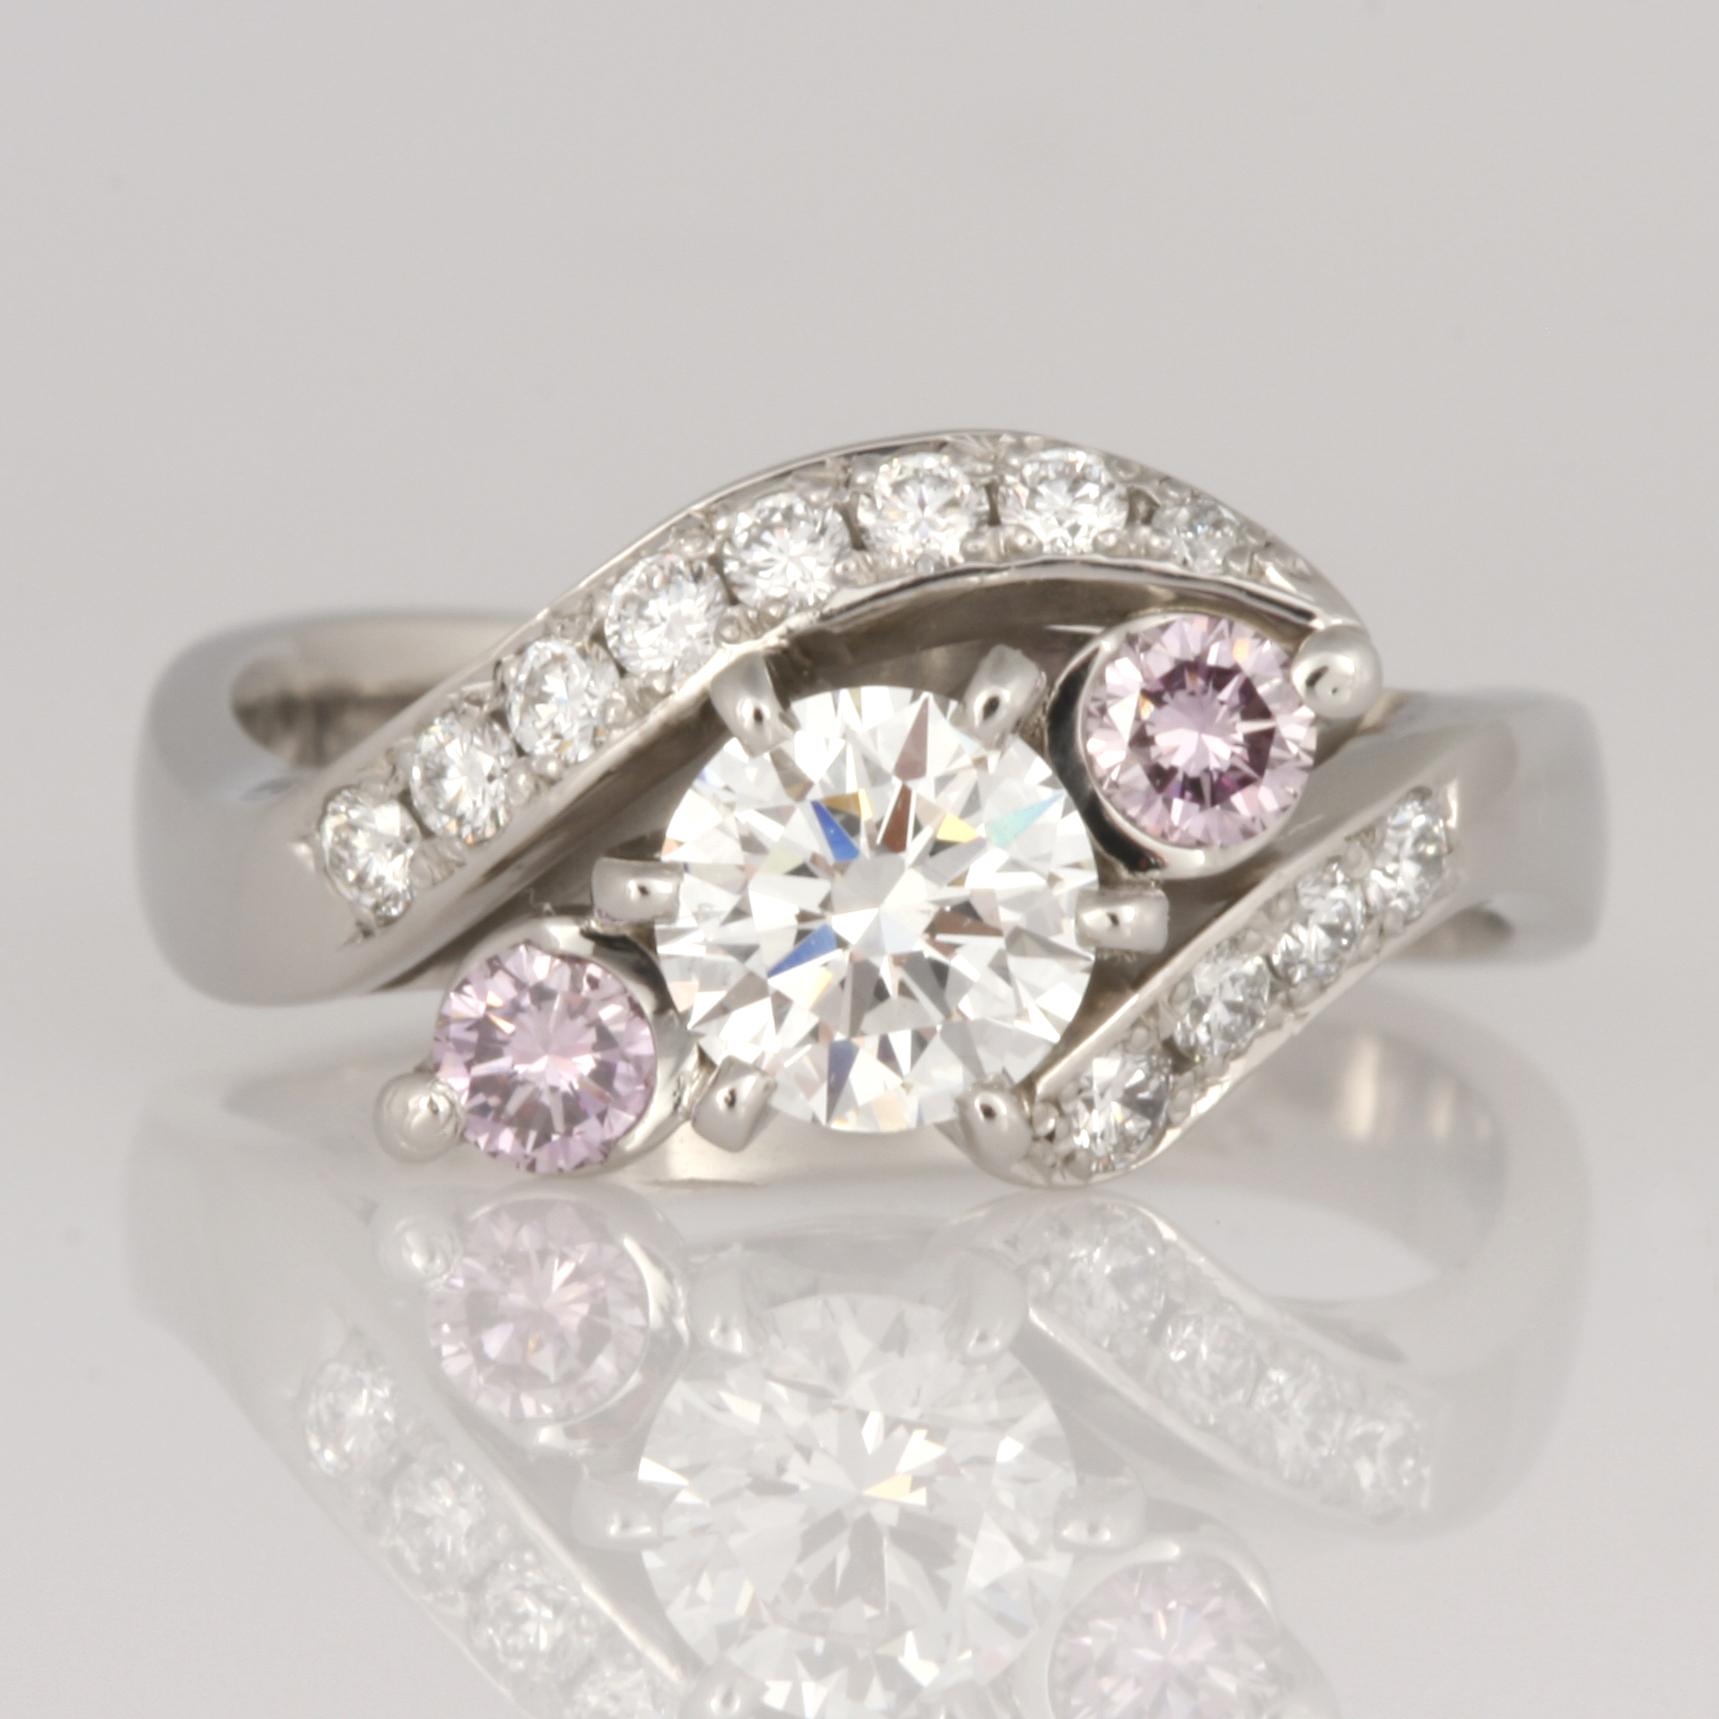 Handmade ladies palladium & platinum diamond engagement ring featuring two purple pink diamonds.